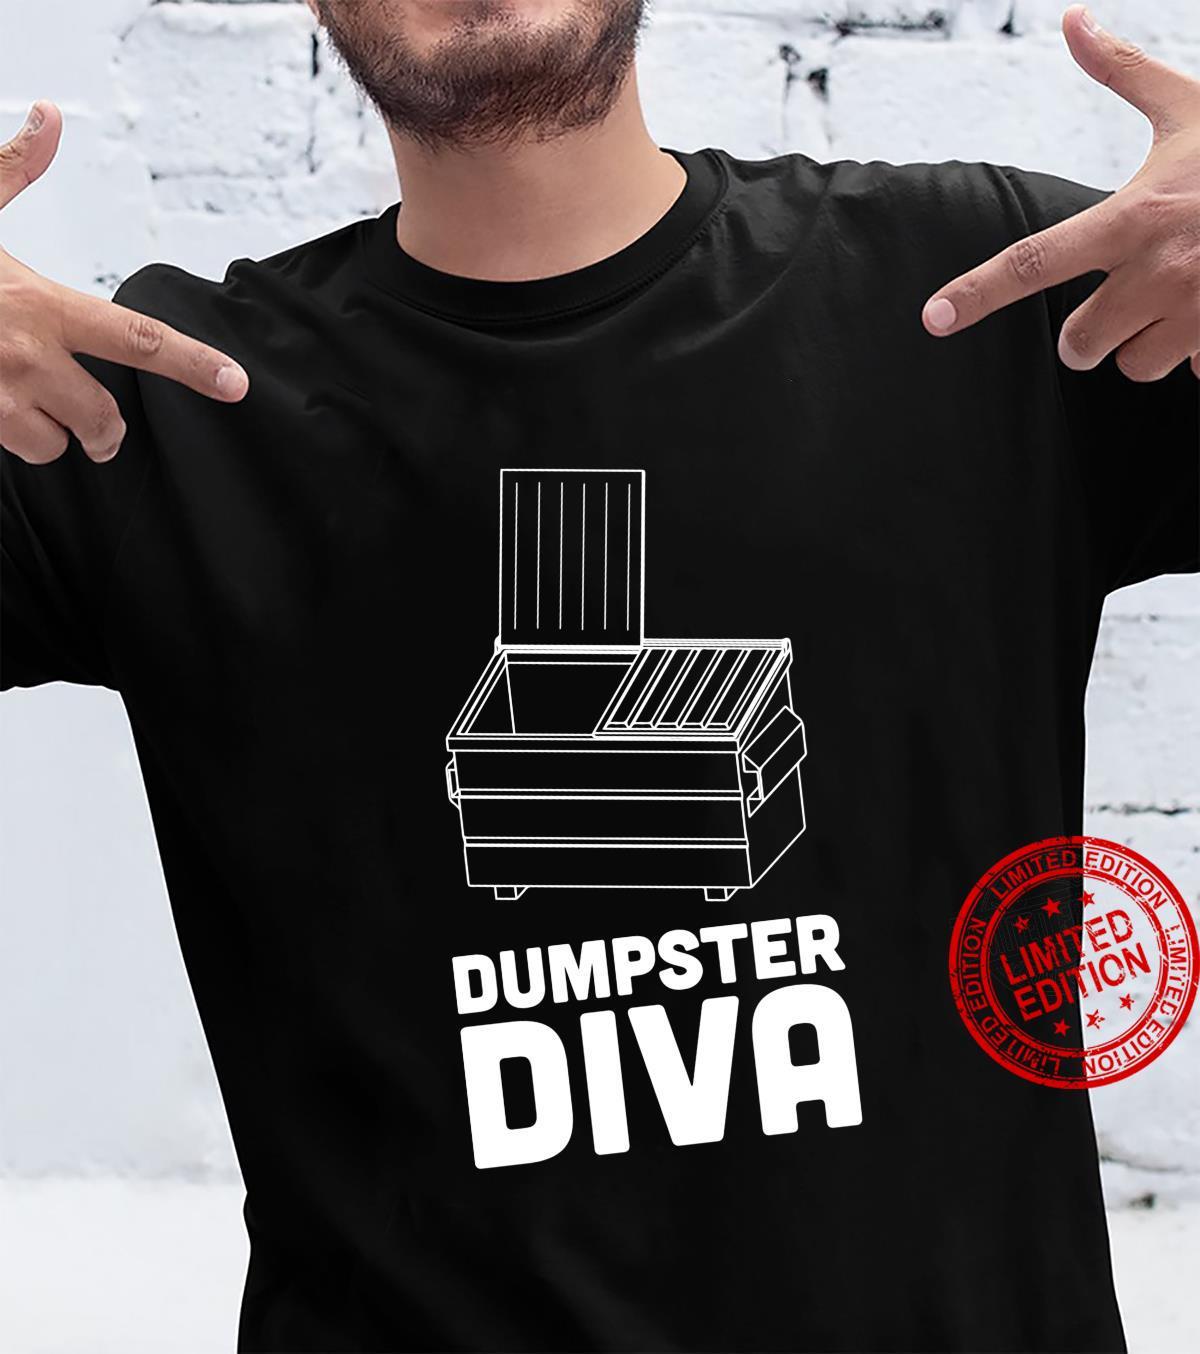 Dumpster diva dumpster diving Shirt